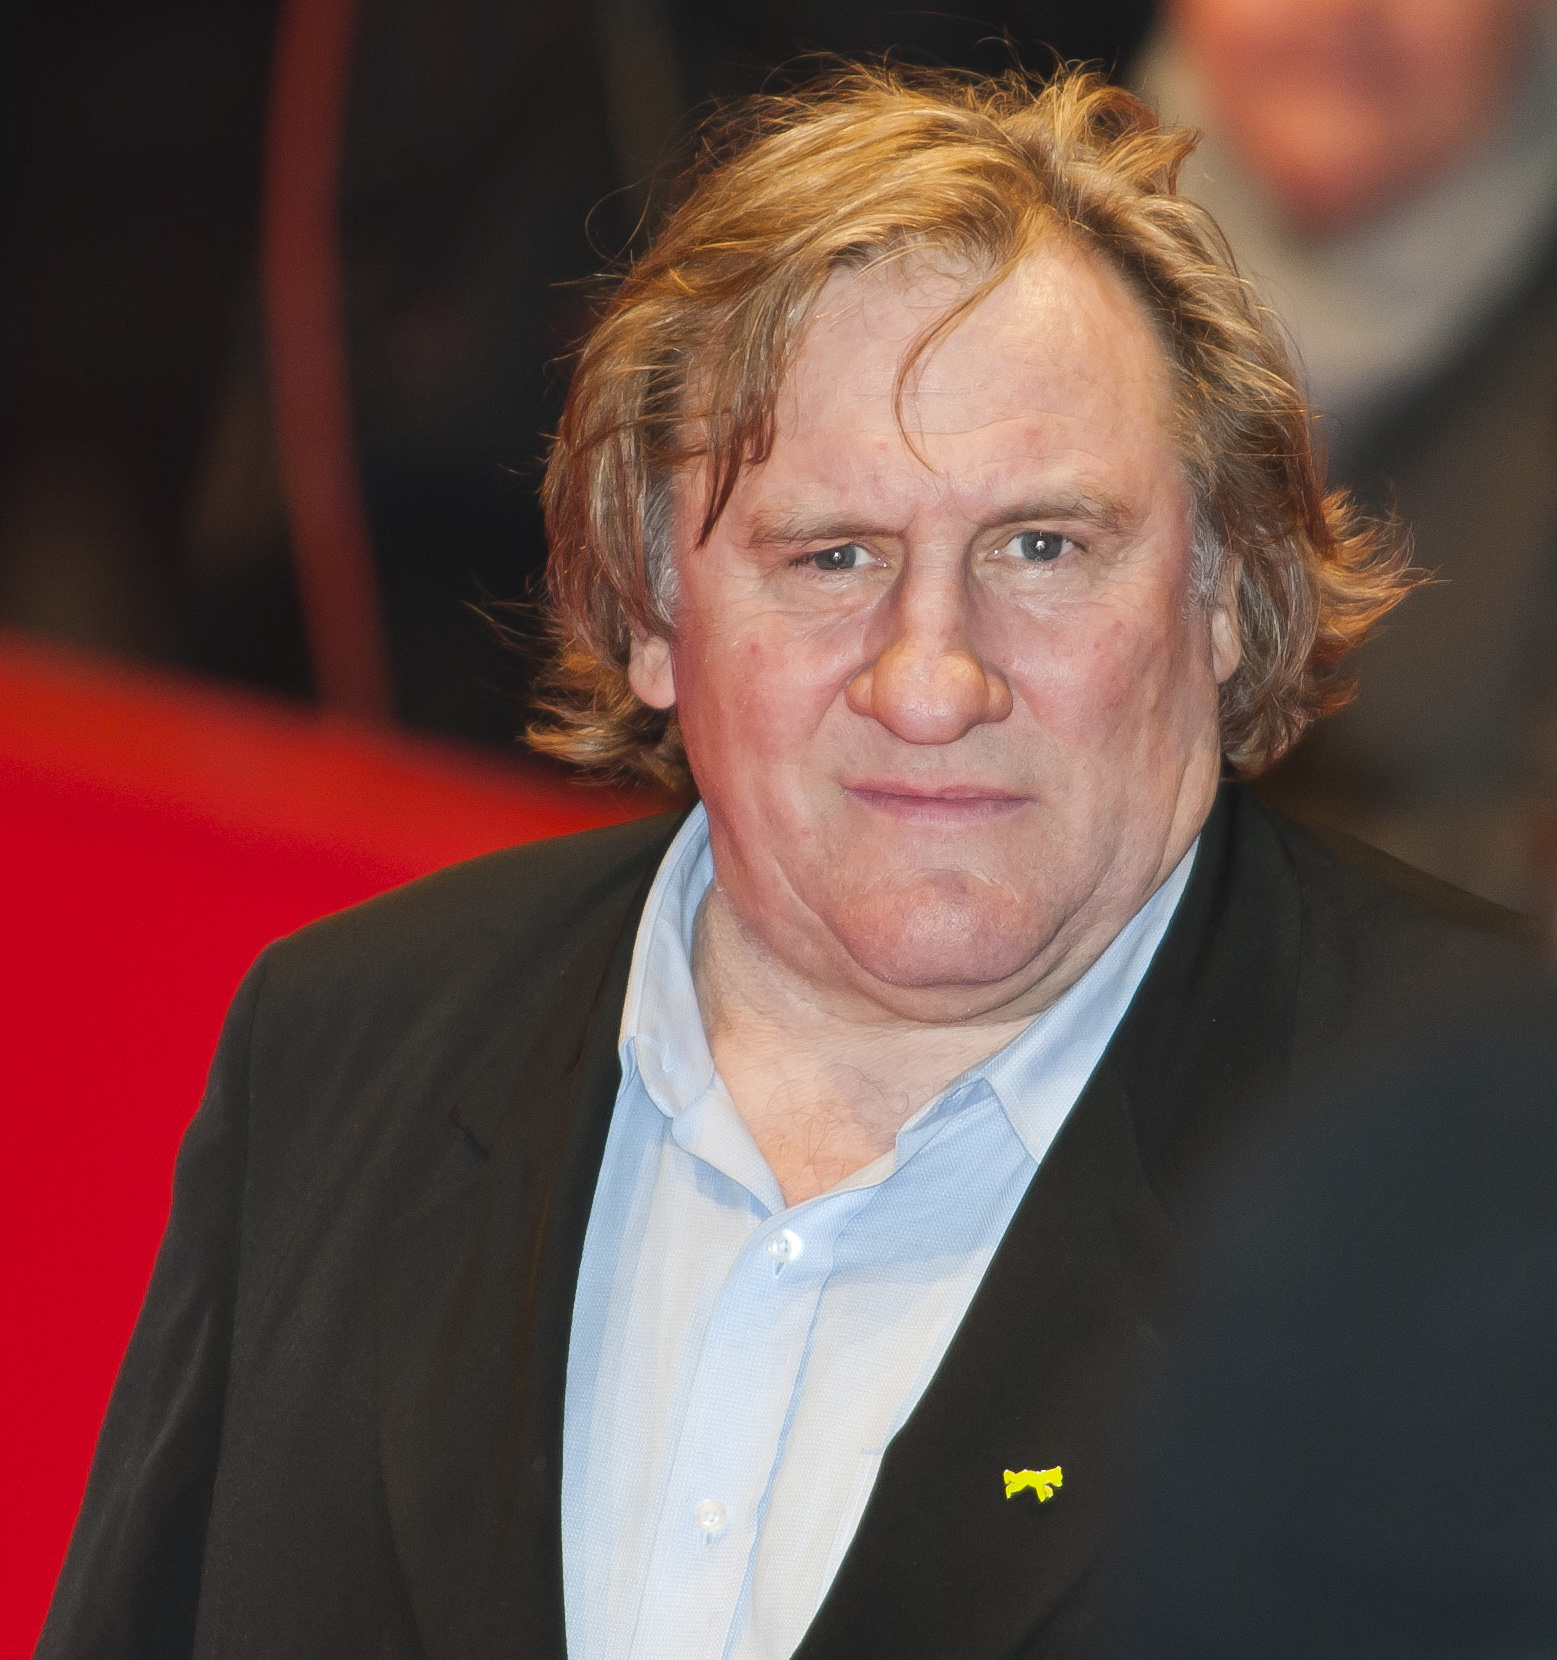 http://upload.wikimedia.org/wikipedia/commons/2/2d/G%C3%A9rard_Depardieu_(Berlin_Film_Festival_2010)_cropped.jpg